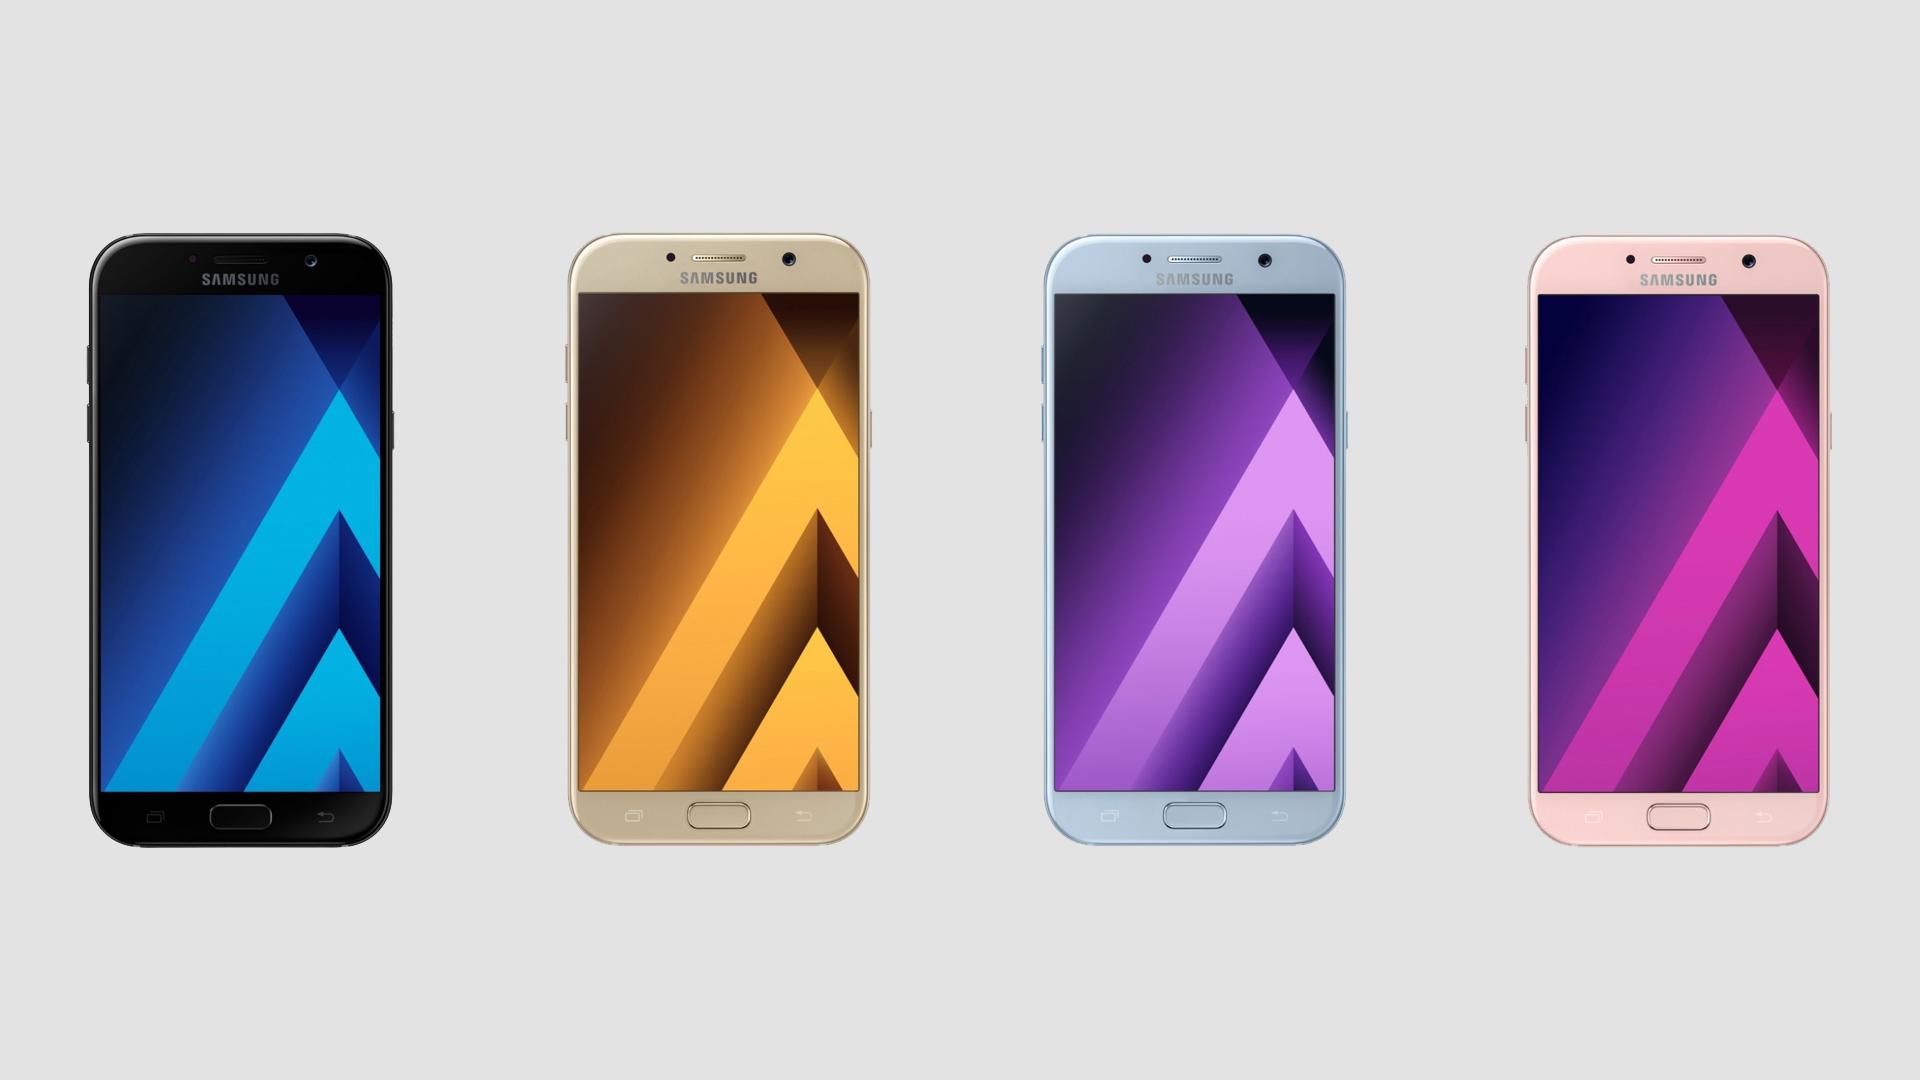 Samsung Galaxy A7 2017 Comienza A Actualizarse A Android Nougat